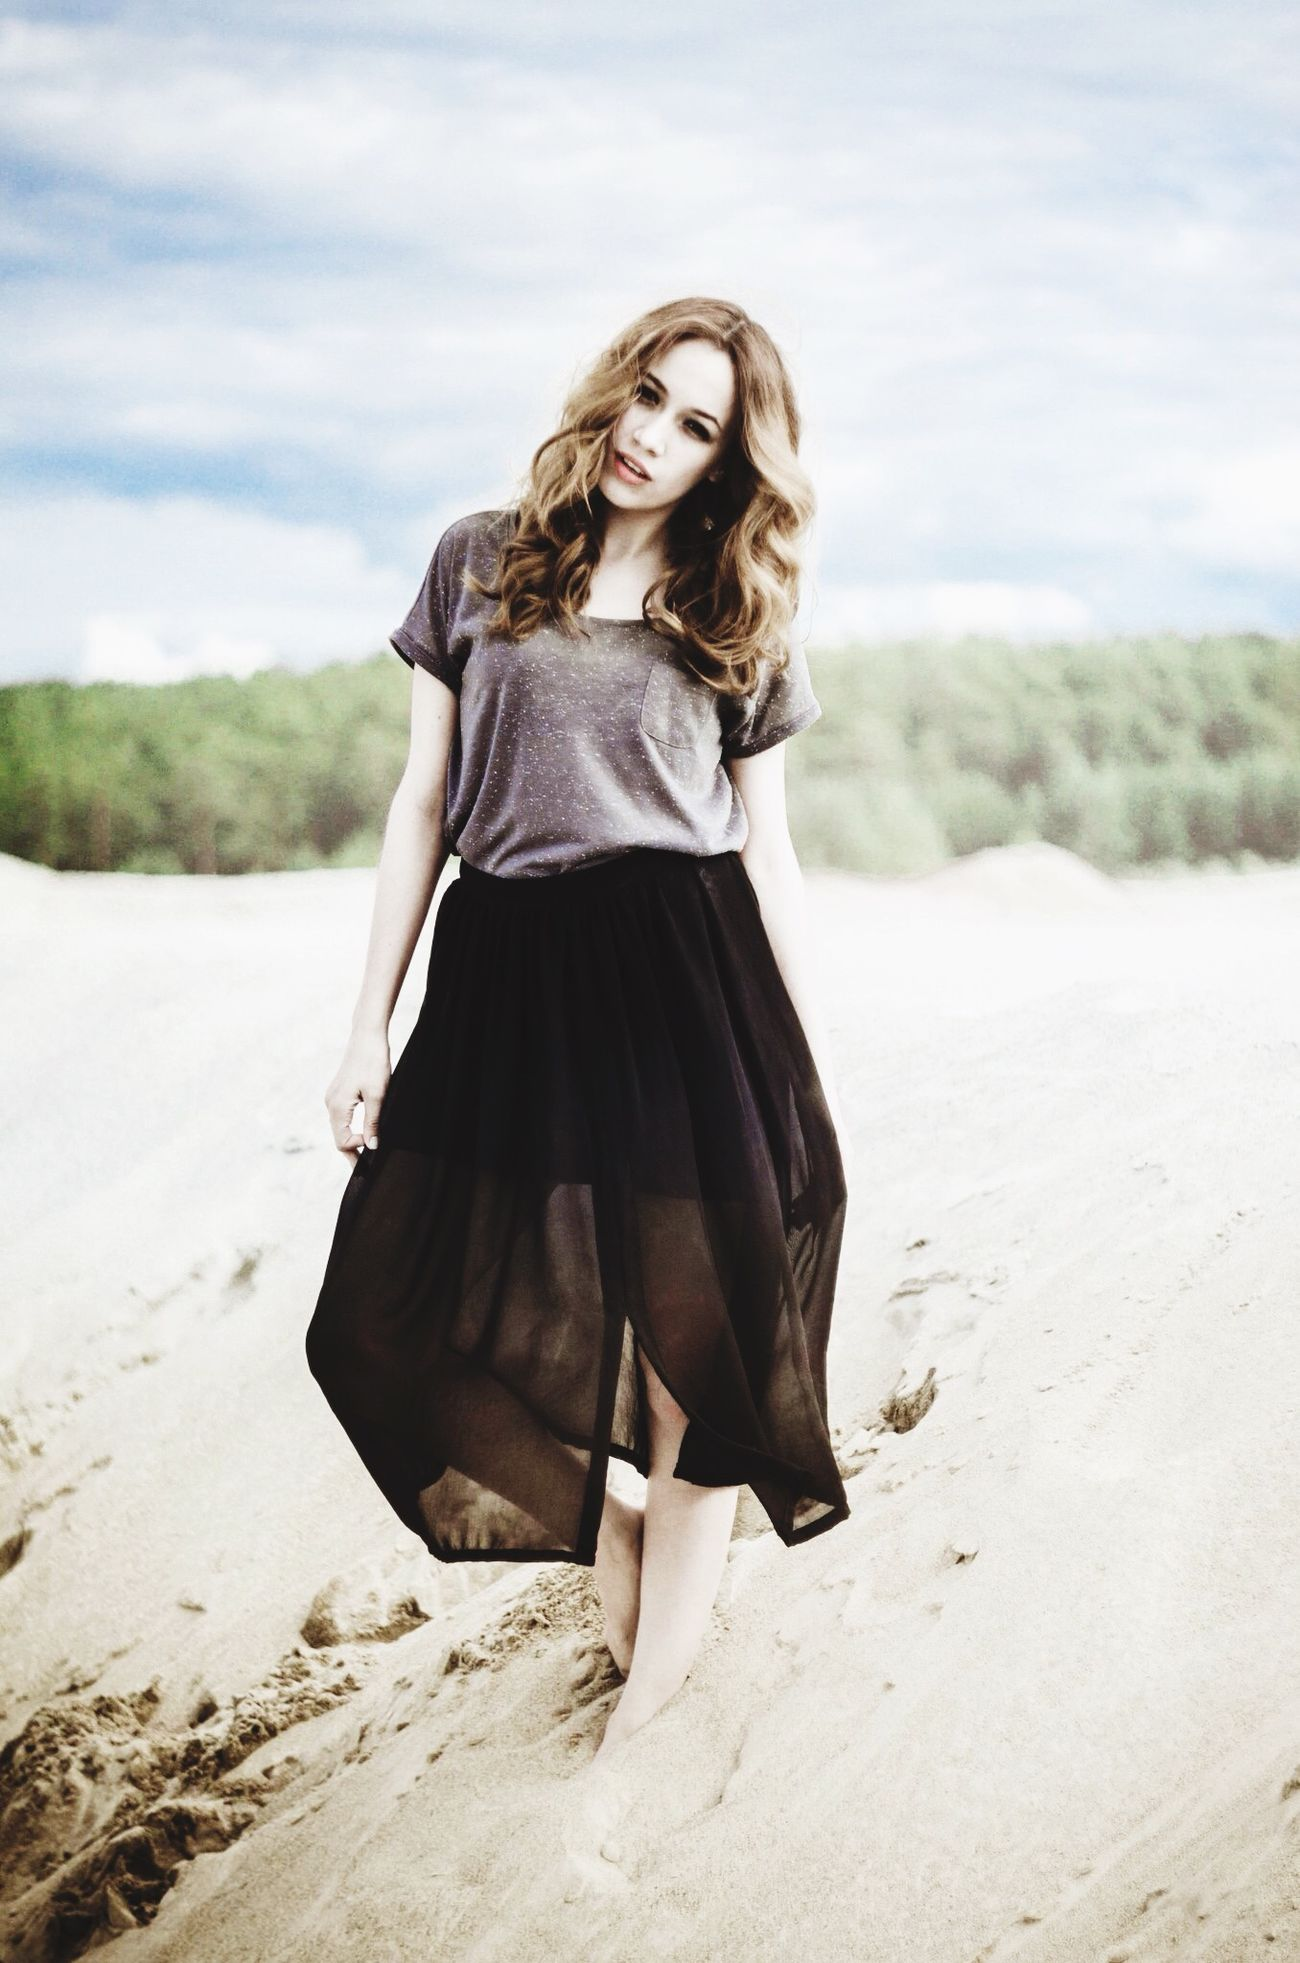 Street Fashion Fashion Hair Goodgirl Moda Modeling Follow Me On Instagram Model Moda Fasion Me :)